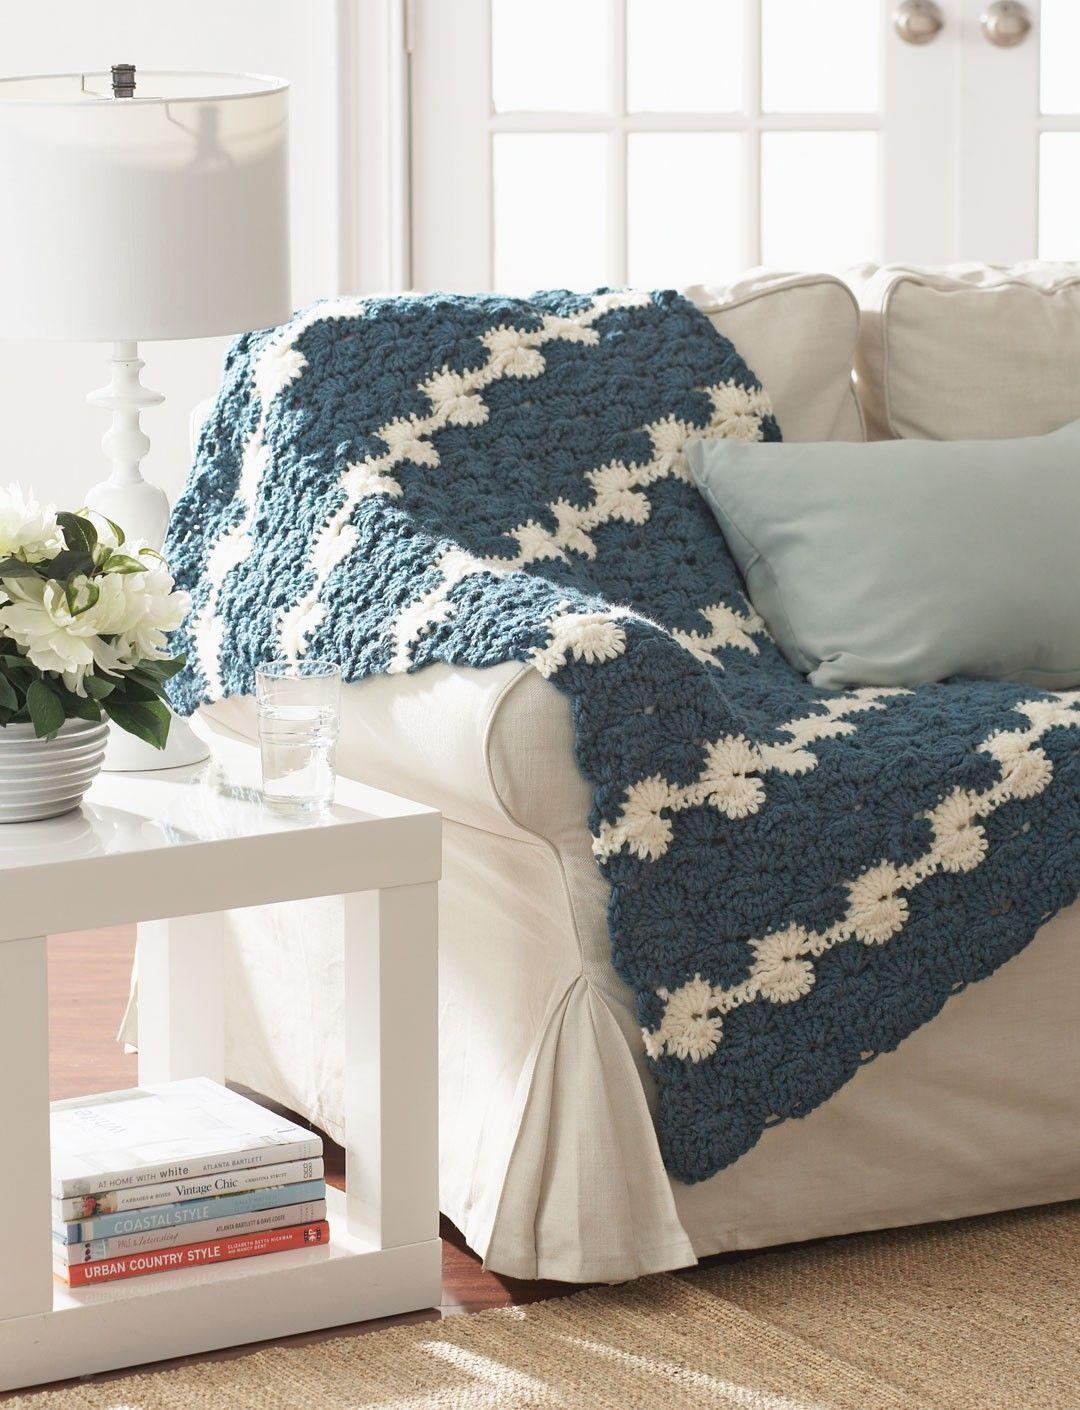 Yarnspirations bernat gentle waves lap blanket patterns bernat gentle waves lap blanket free easy afghan crochet pattern p dt1010fo